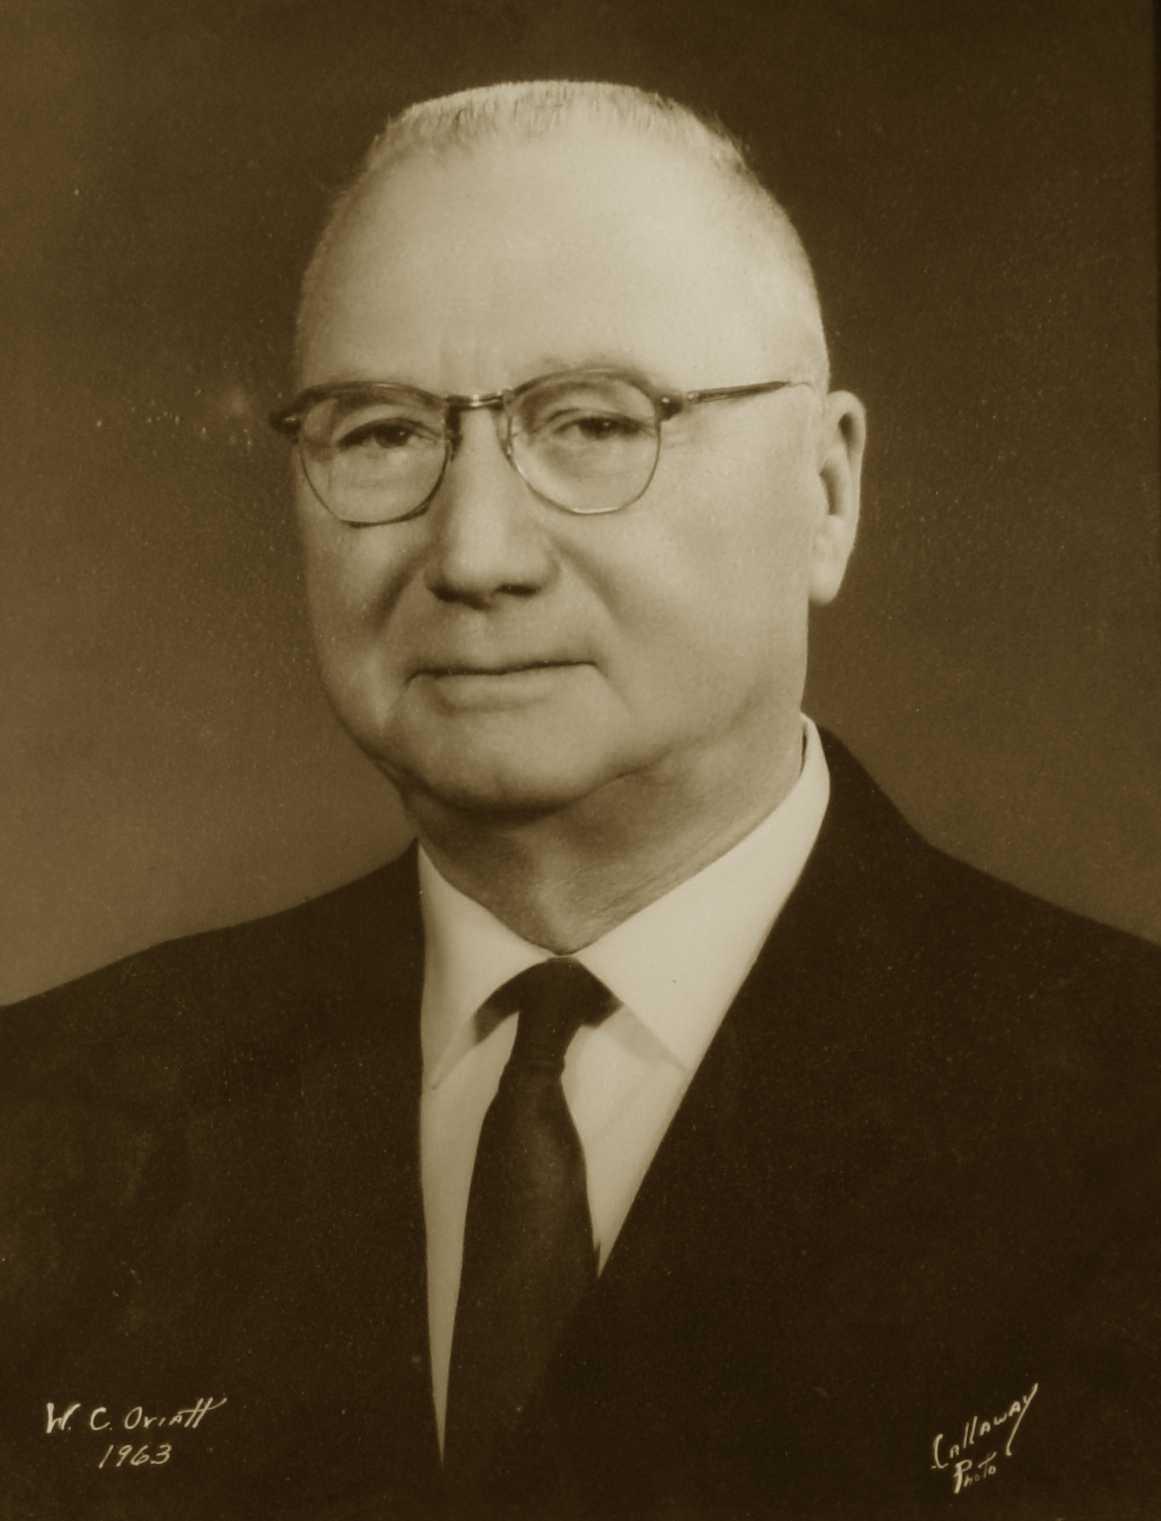 W. C. Oviatt, 1963